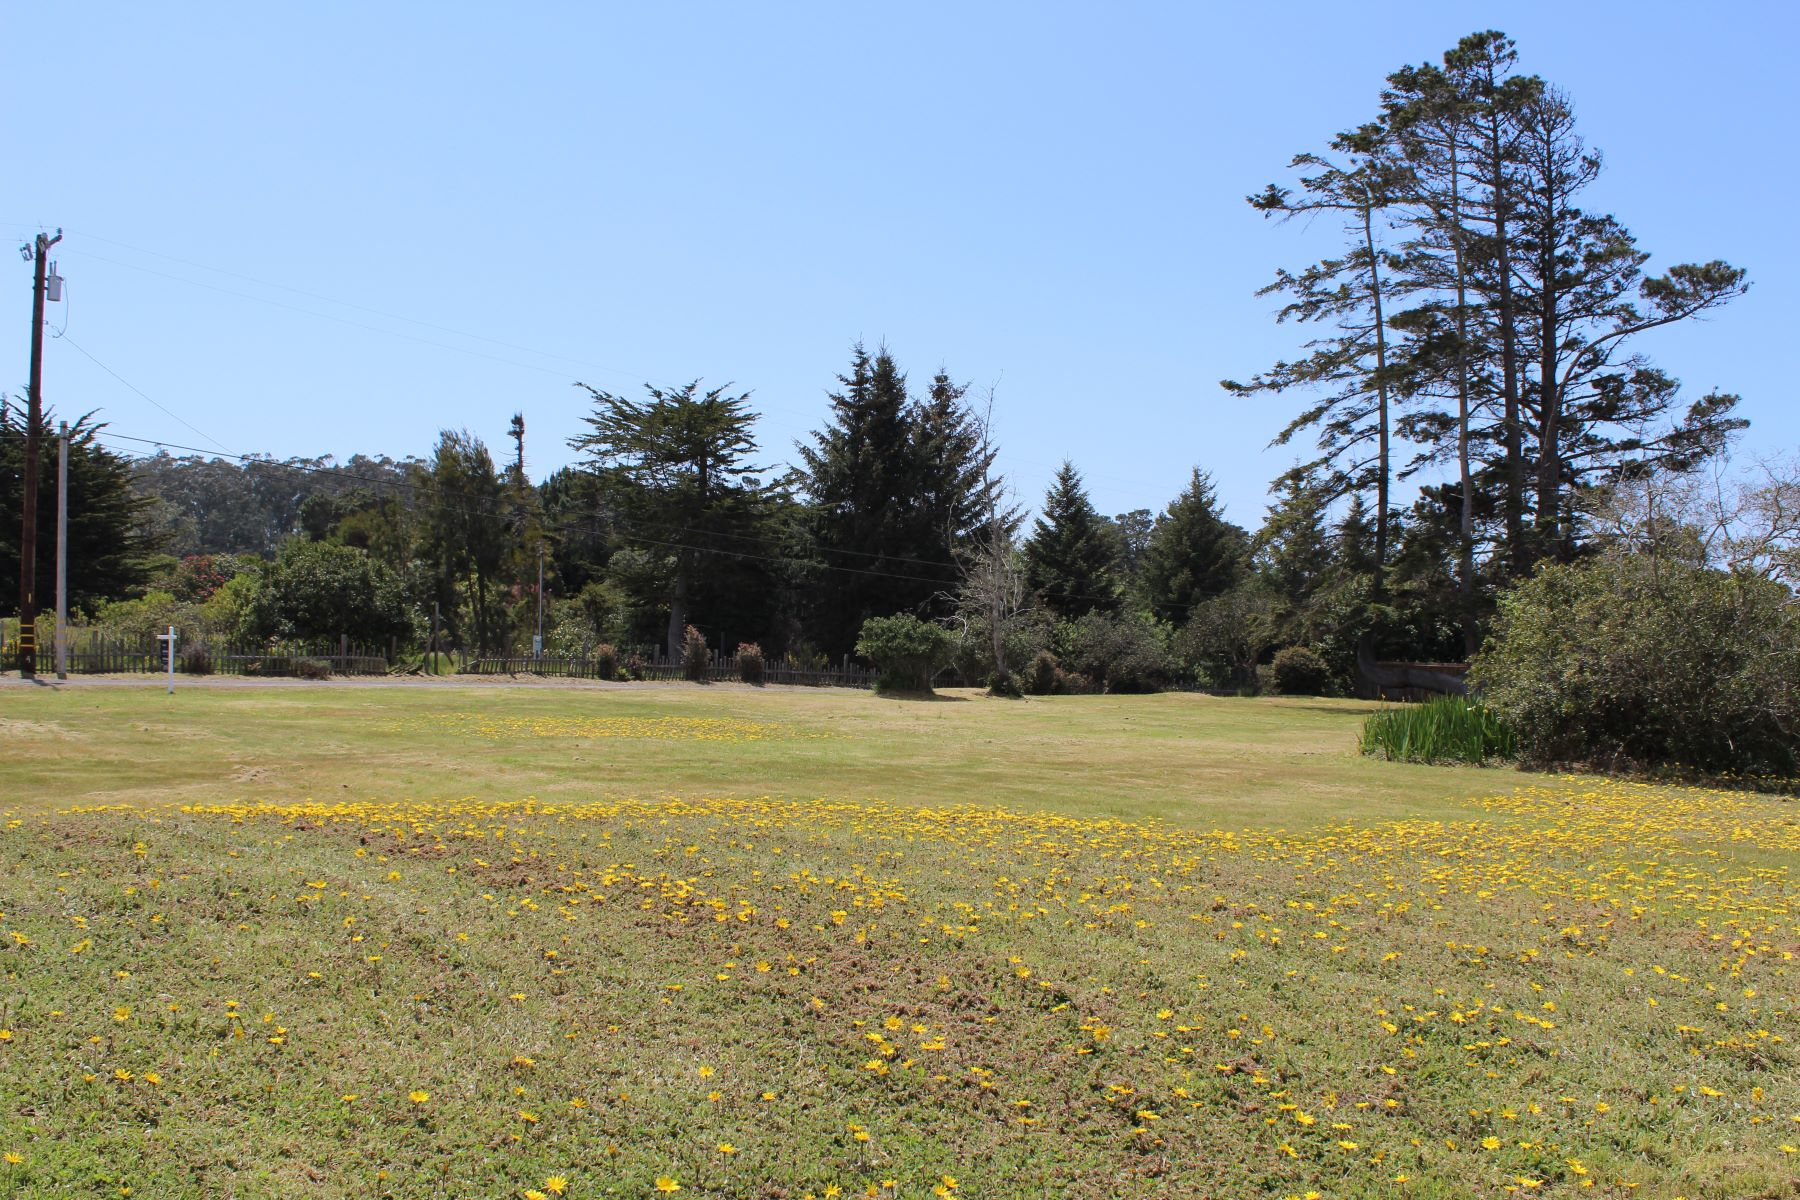 Land for Sale at Coastal Gem 18312 N. Highway One Fort Bragg, California 95437 United States